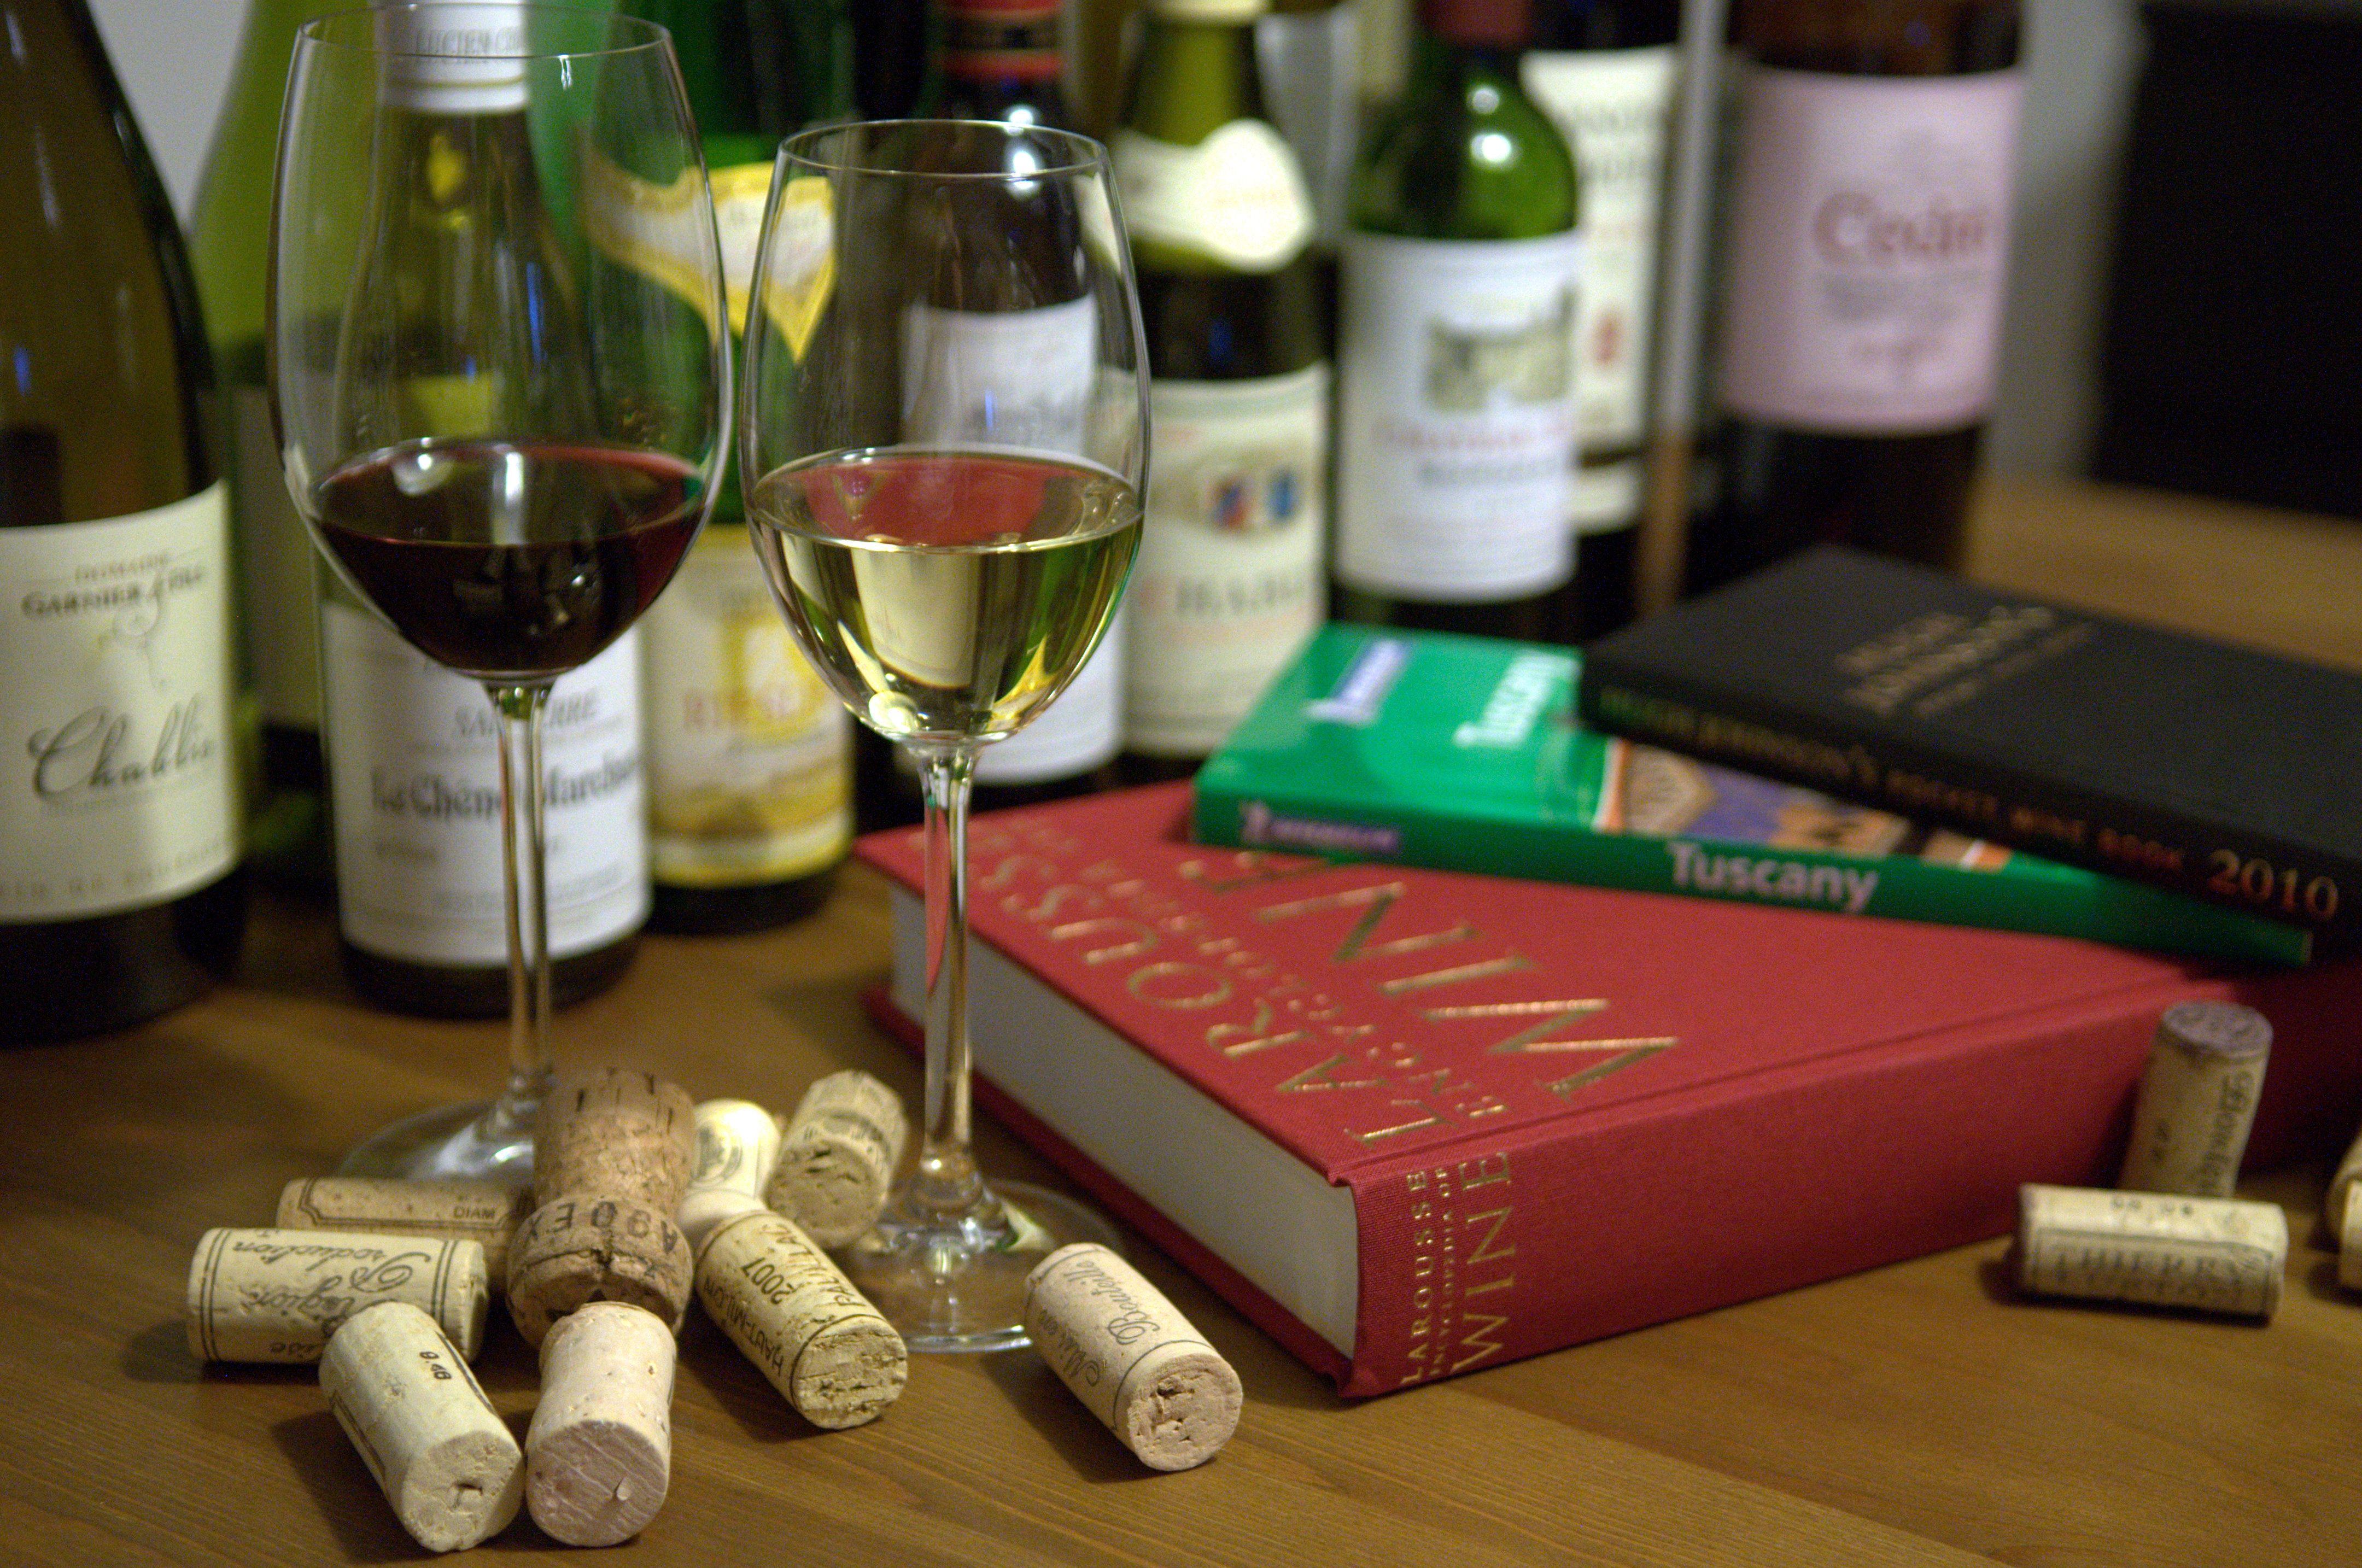 Loudoun County Women's Wine and Books Meetup